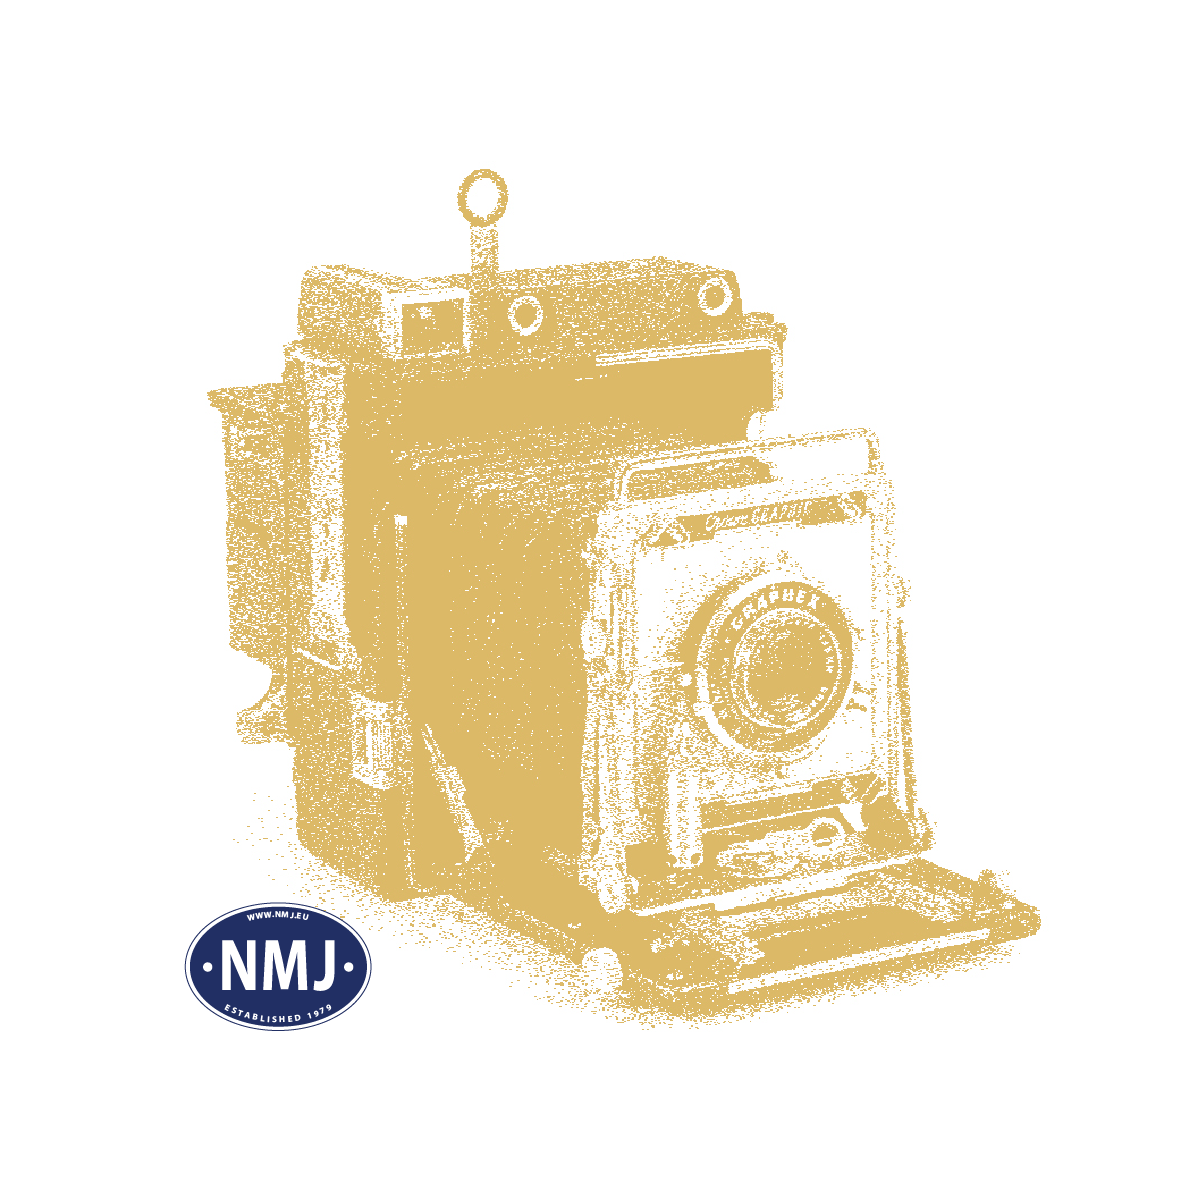 NMJT86.201AC - NMJ Topline NSB El11.2107, Gammeldeisgn, AC